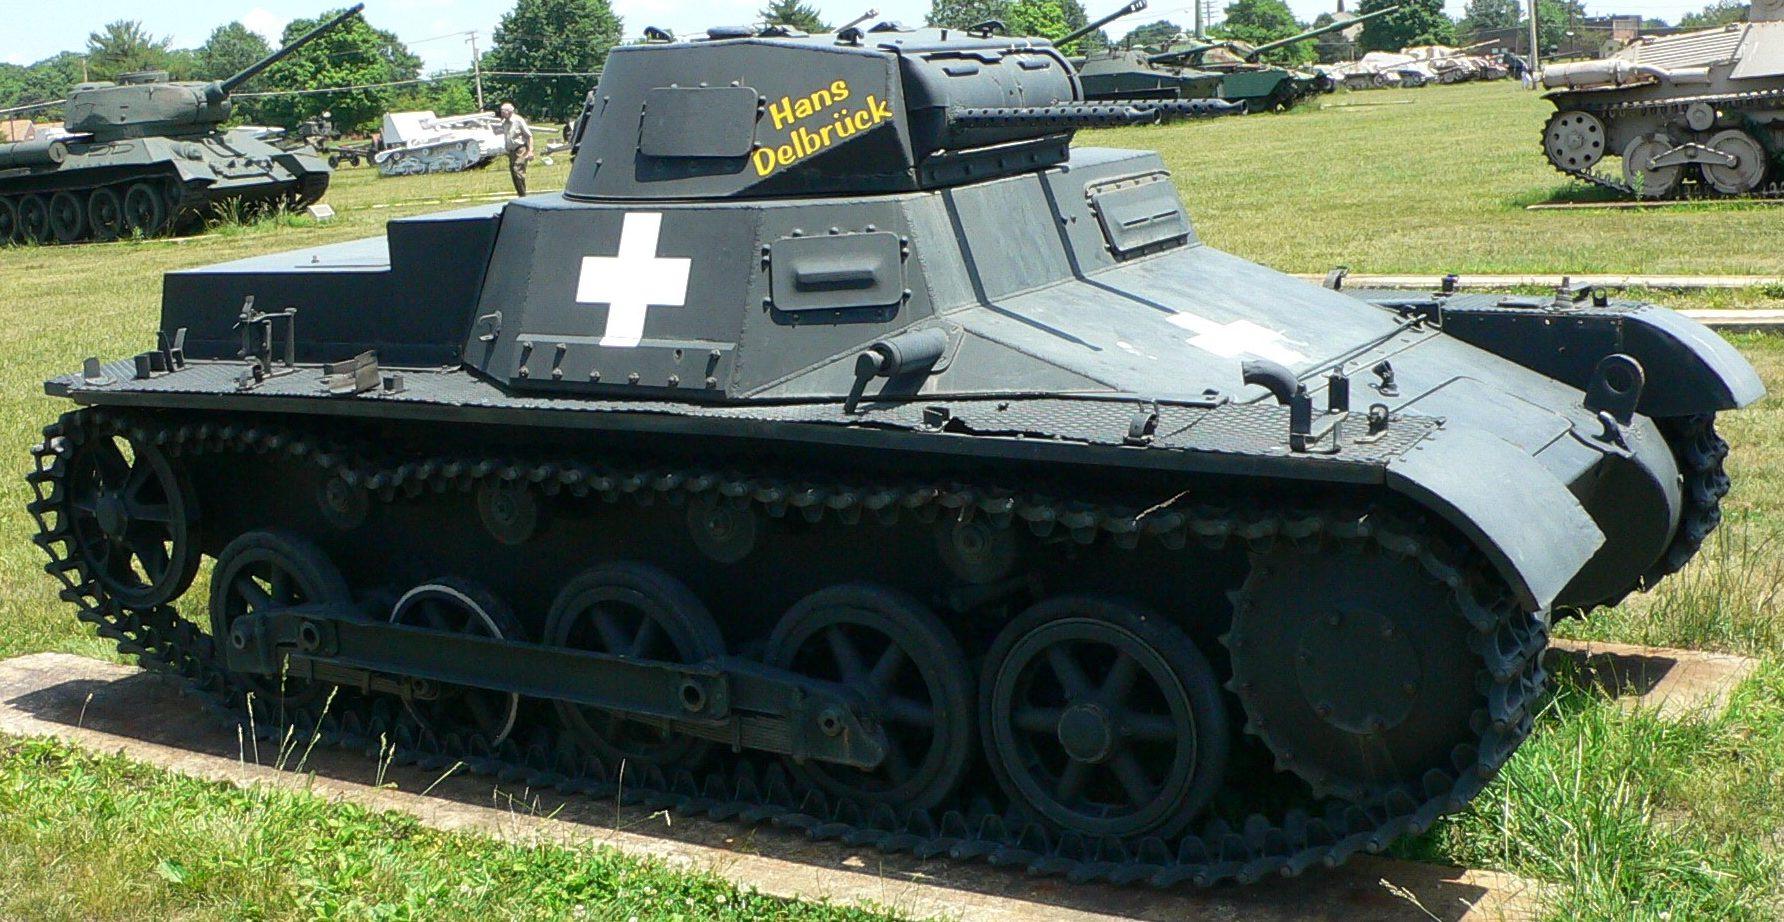 Panzerkampfwagen I Ausf.B (Pz.Kpfw.I Ausf.B).